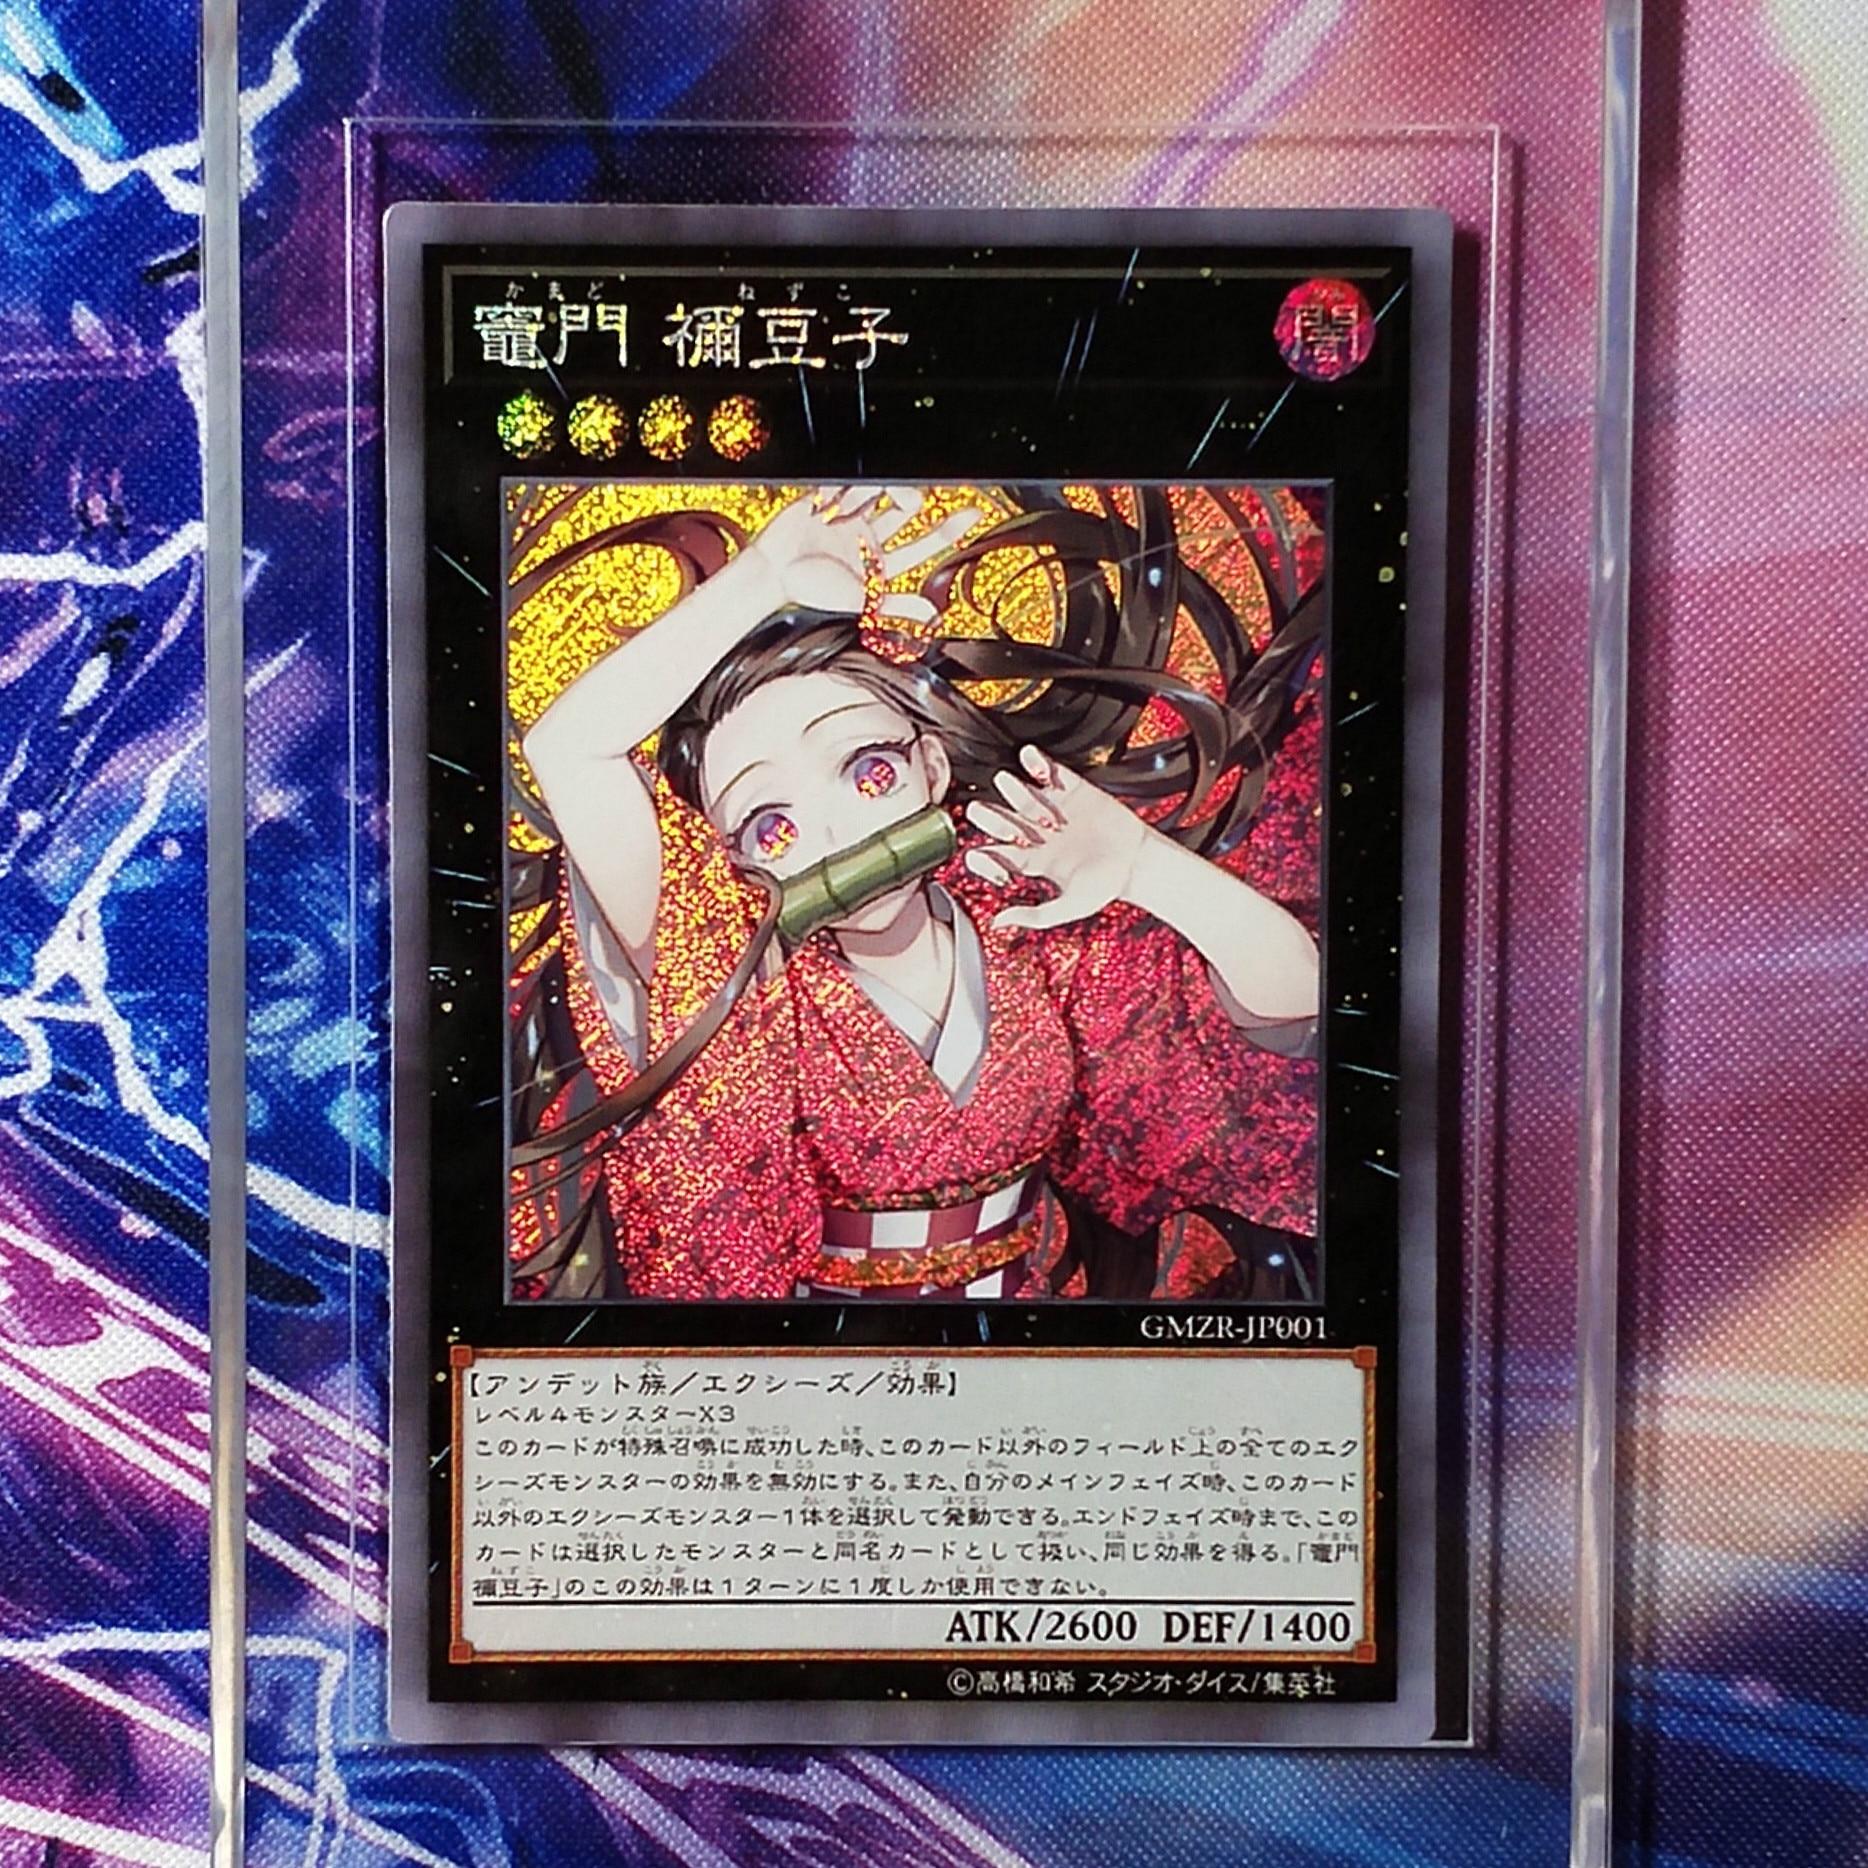 Demon Slayer Kamado Nezuko YU GI OH DIY Colorful Toys Hobbies Hobby Collectibles Game Collection Anime Cards